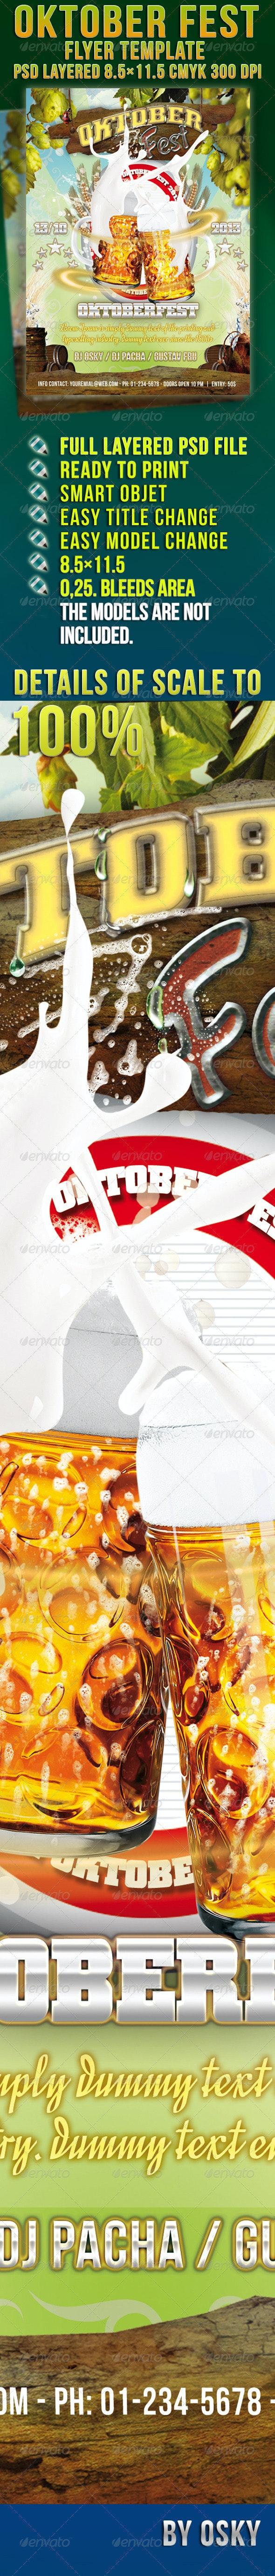 Oktober Fest Flyer - Clubs & Parties Events